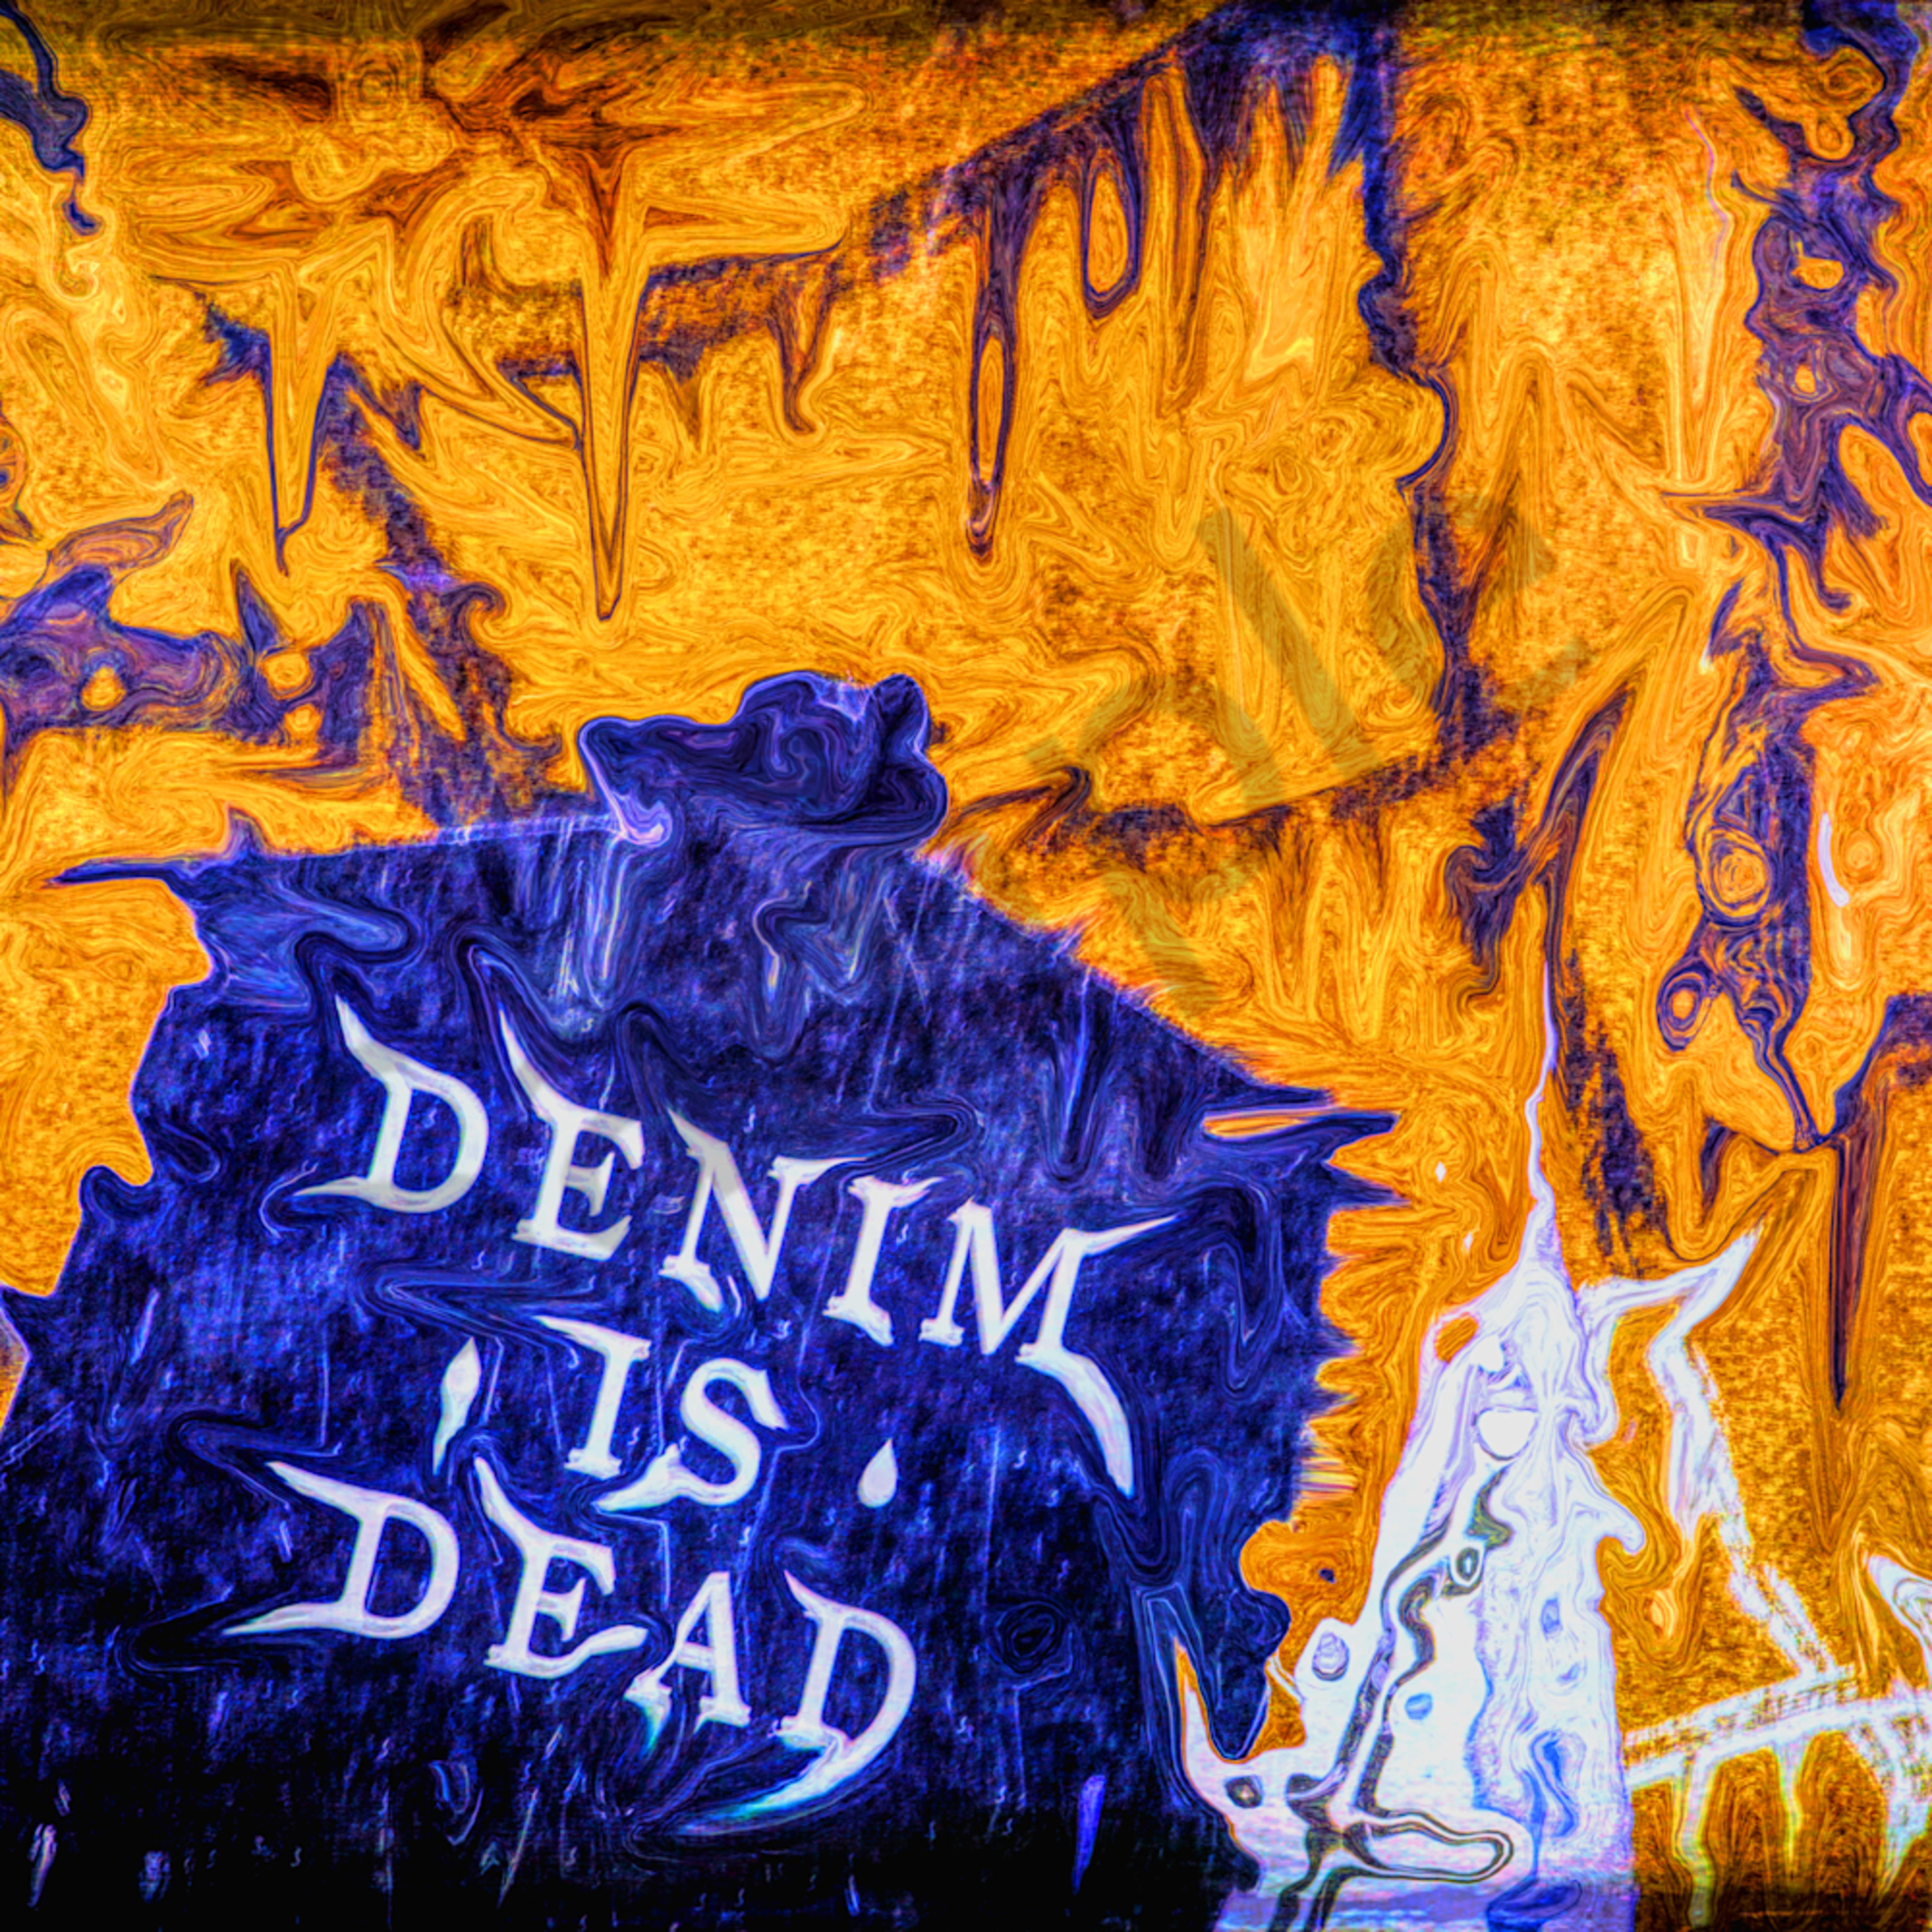 Denim is dead website kzmnyo